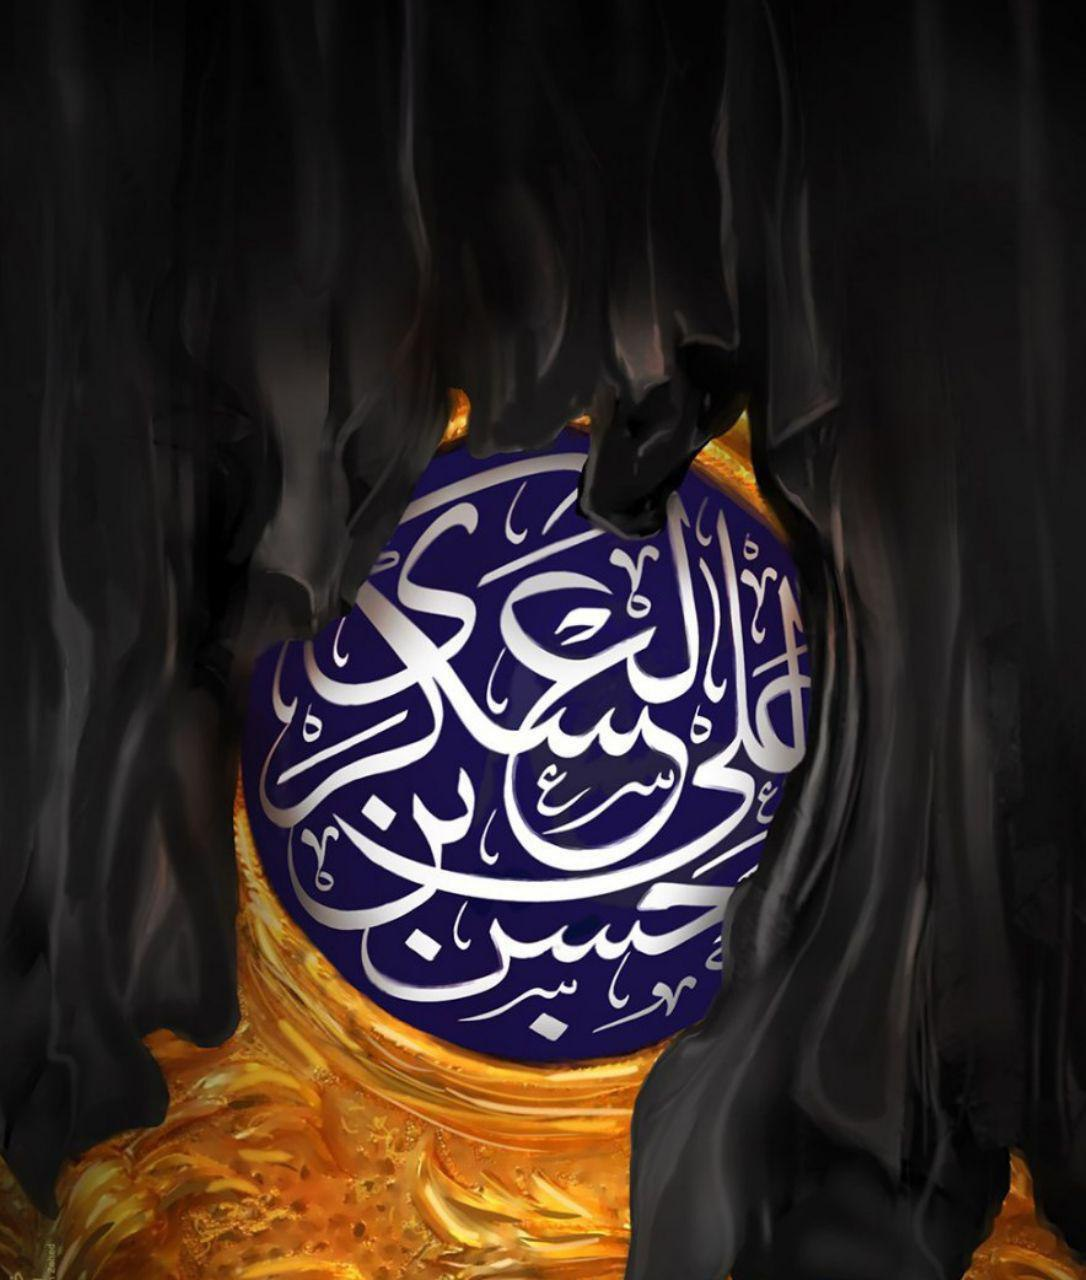 امام عسکری علیه السلام و تقیه شدید